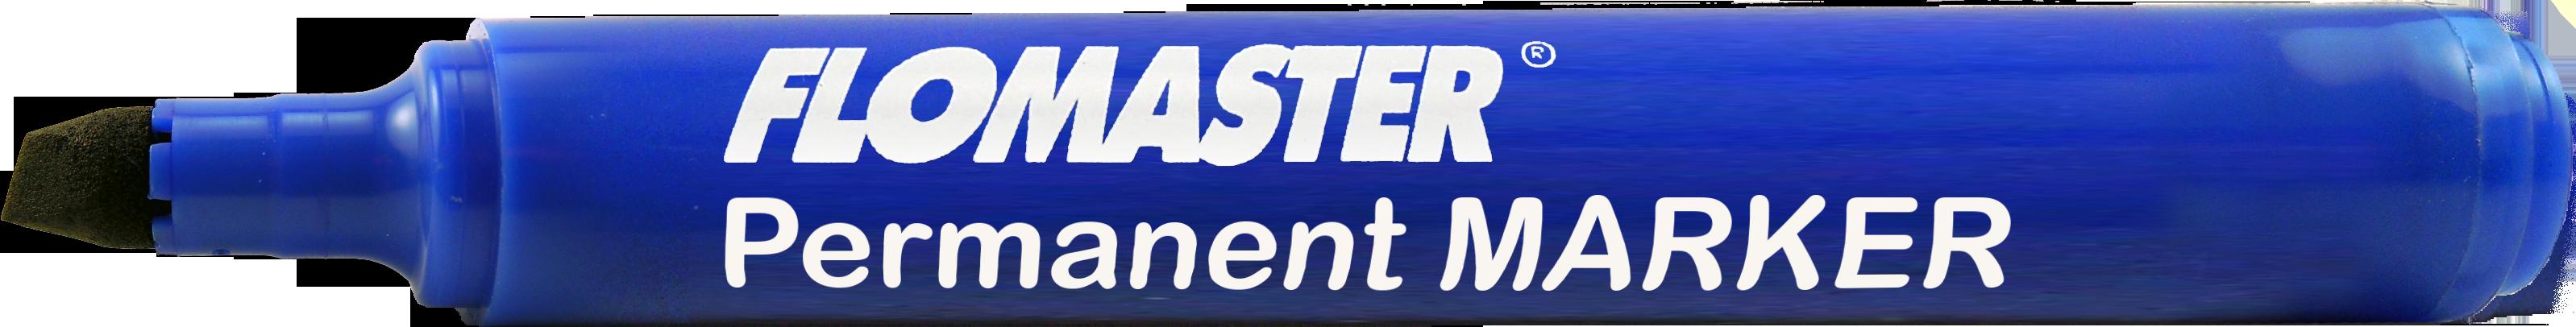 Flomaster Permanent